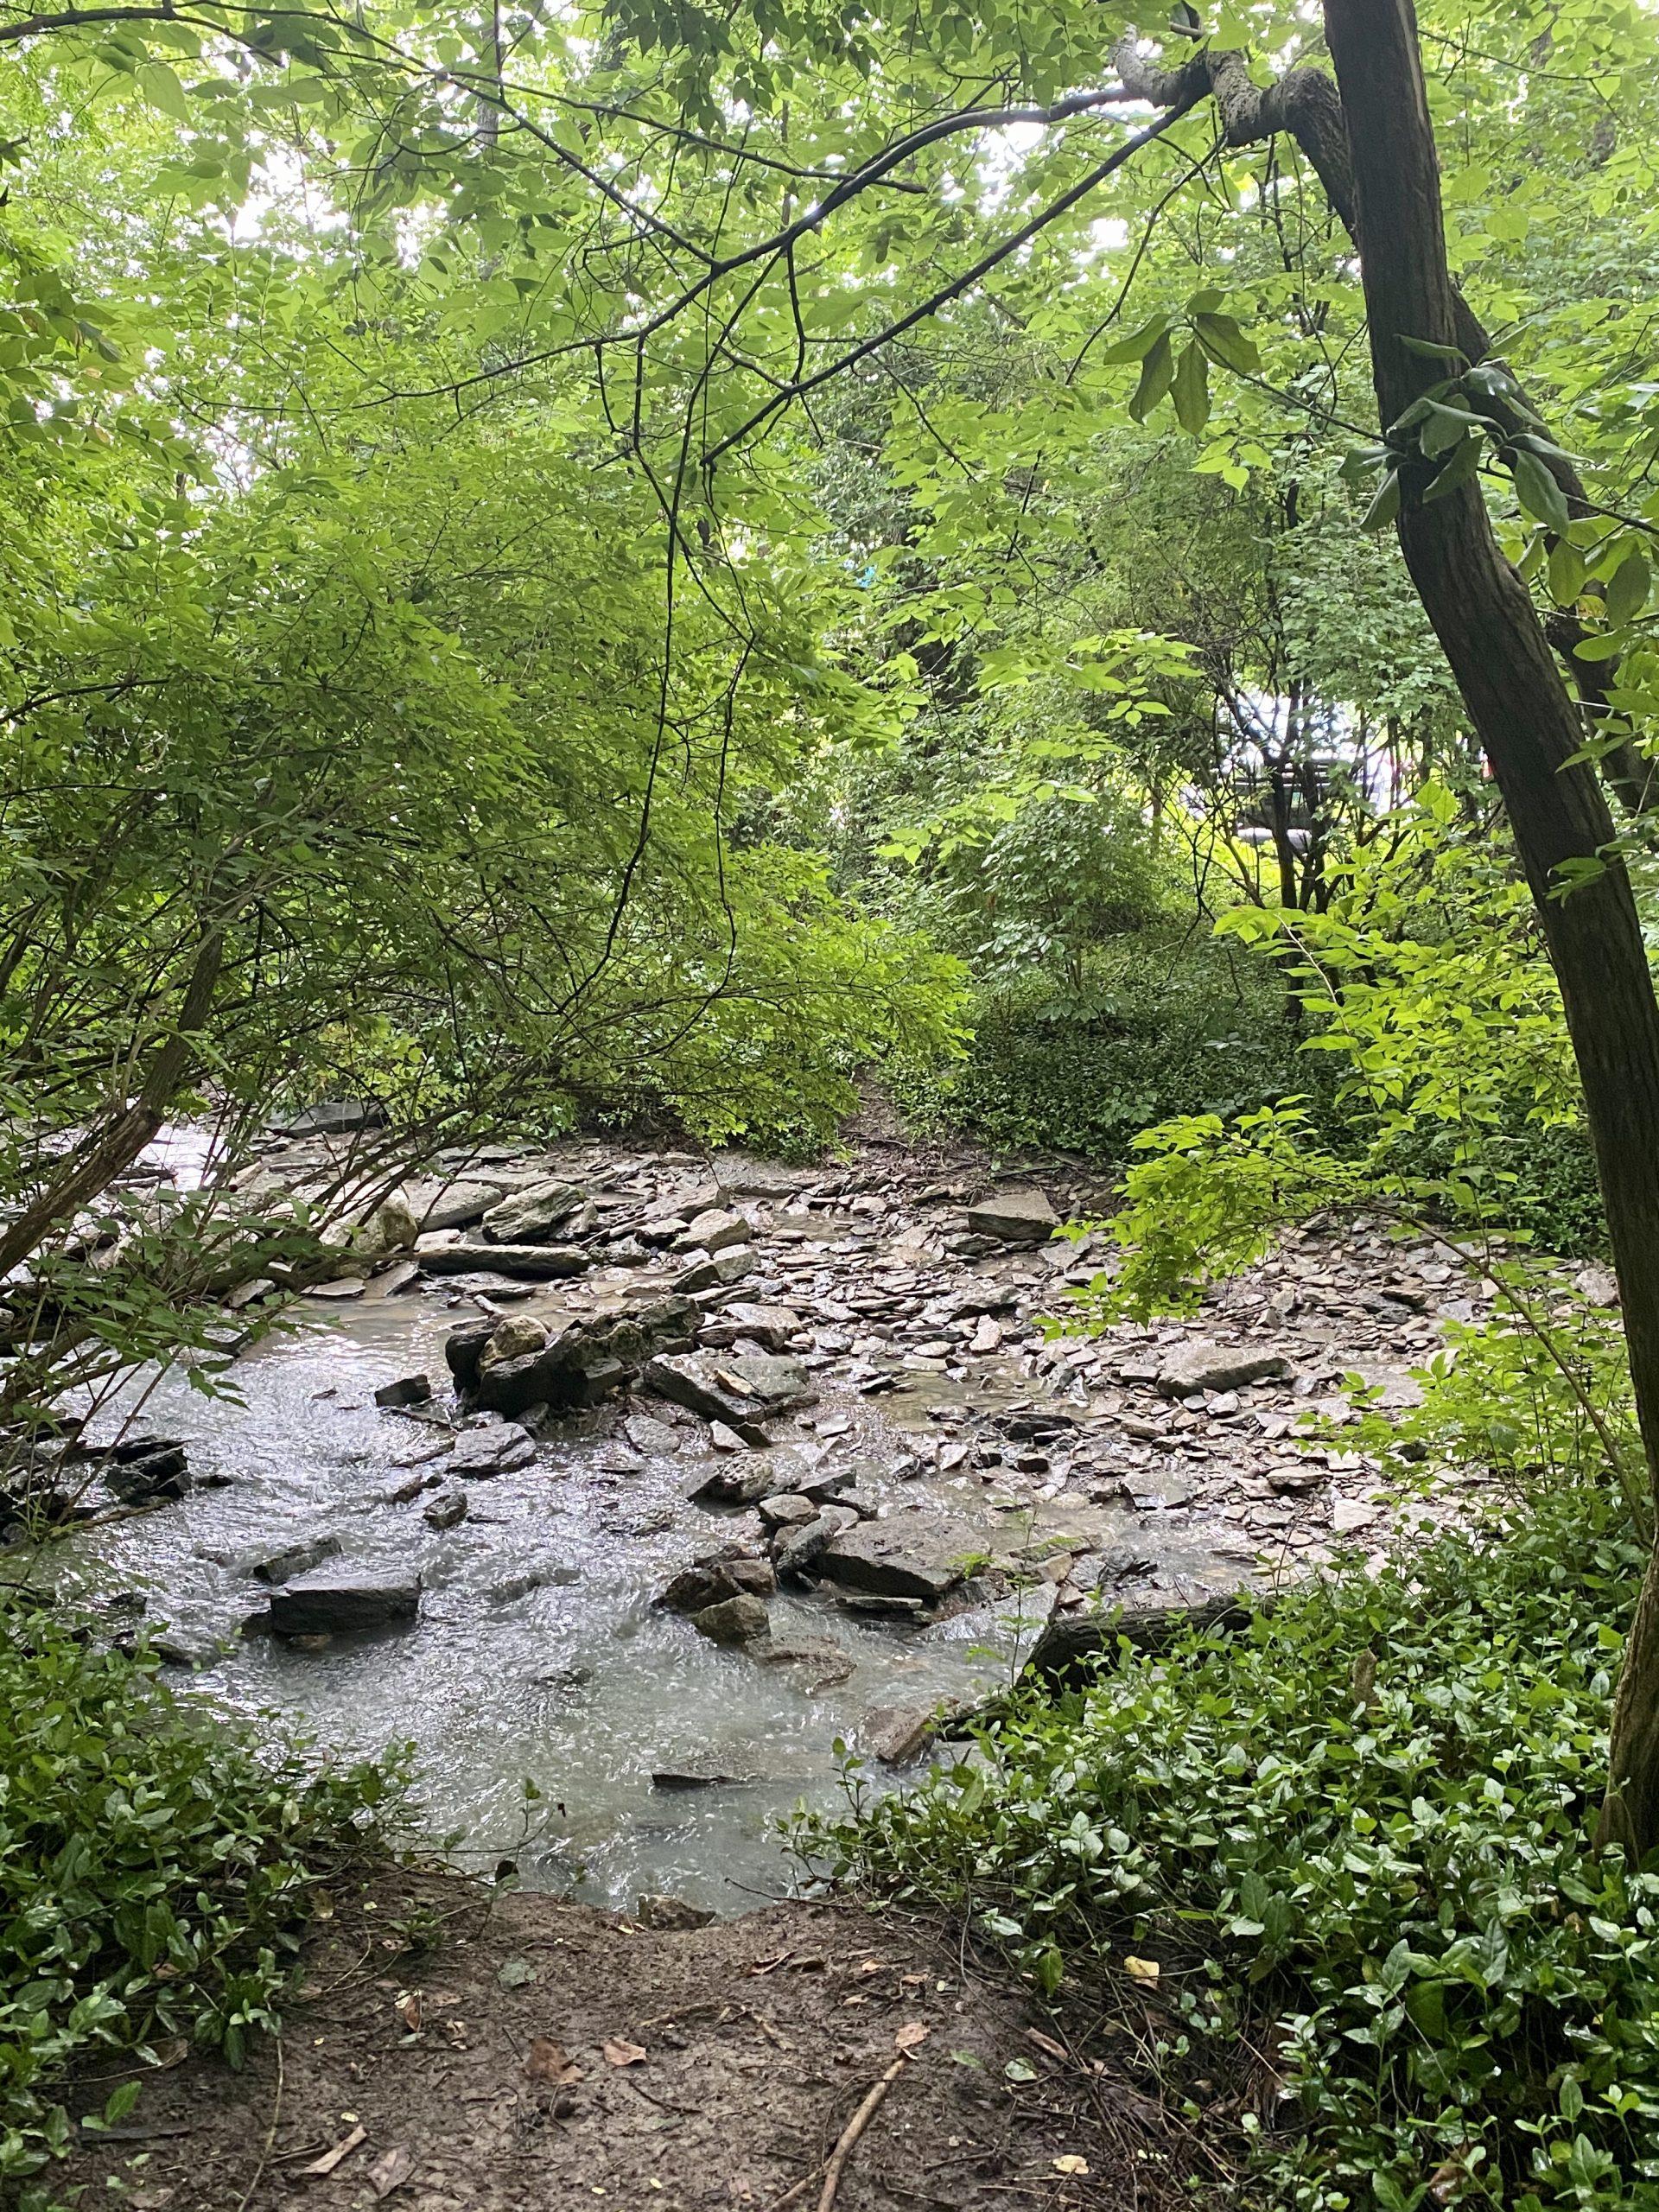 East Loveland Nature Preserve